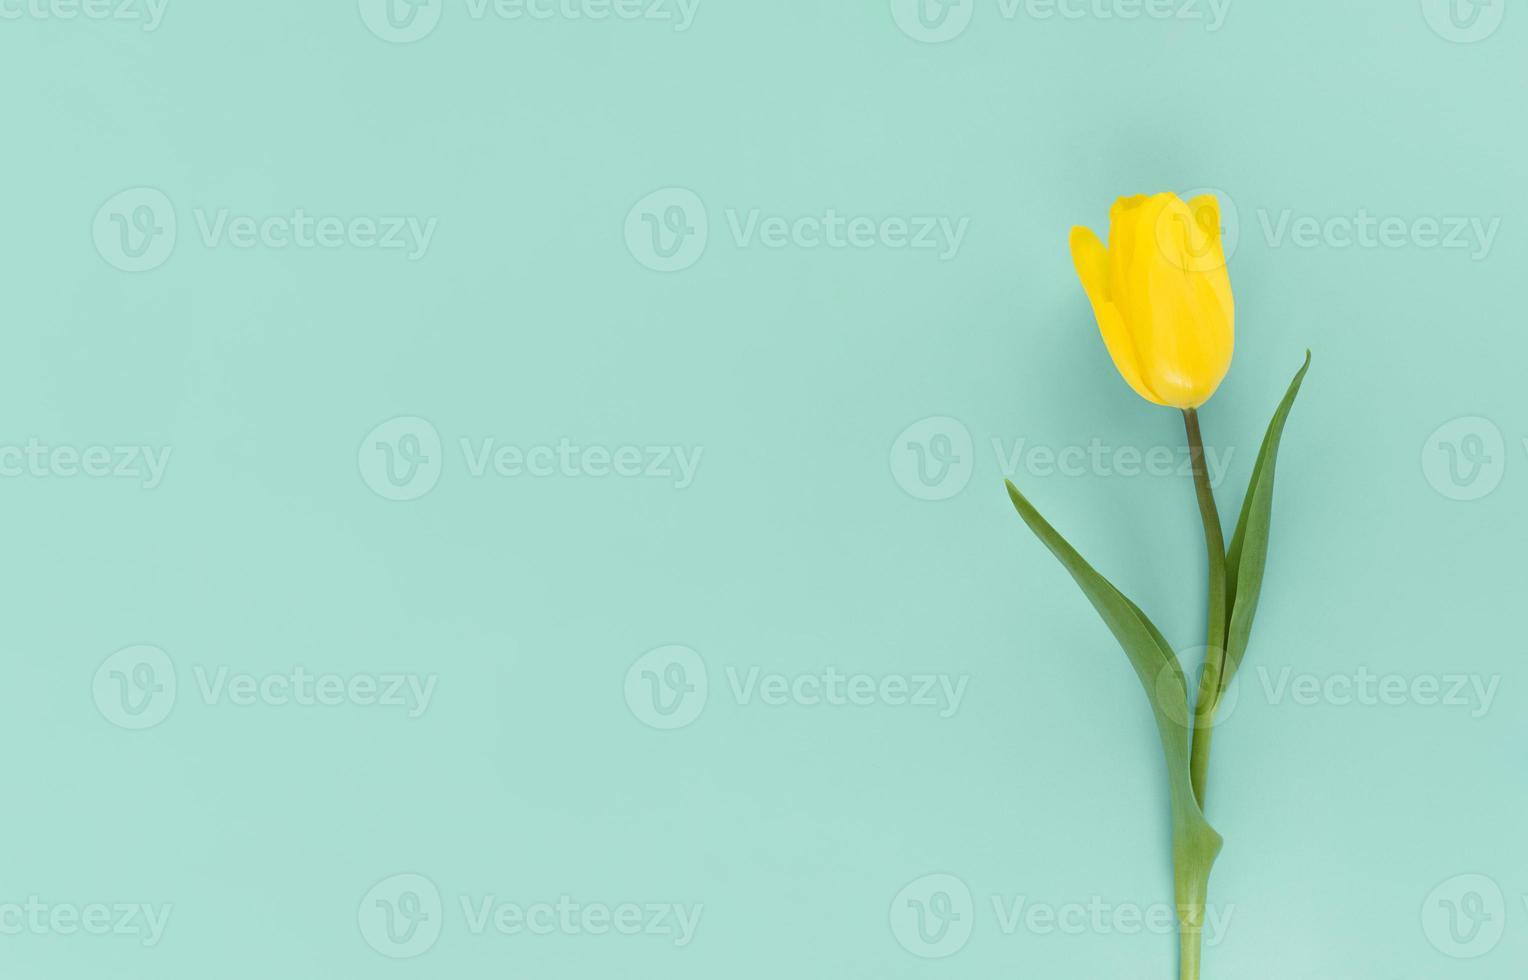 Tulipe jaune sur fond vert plat mimimaliste poser avec espace copie photo